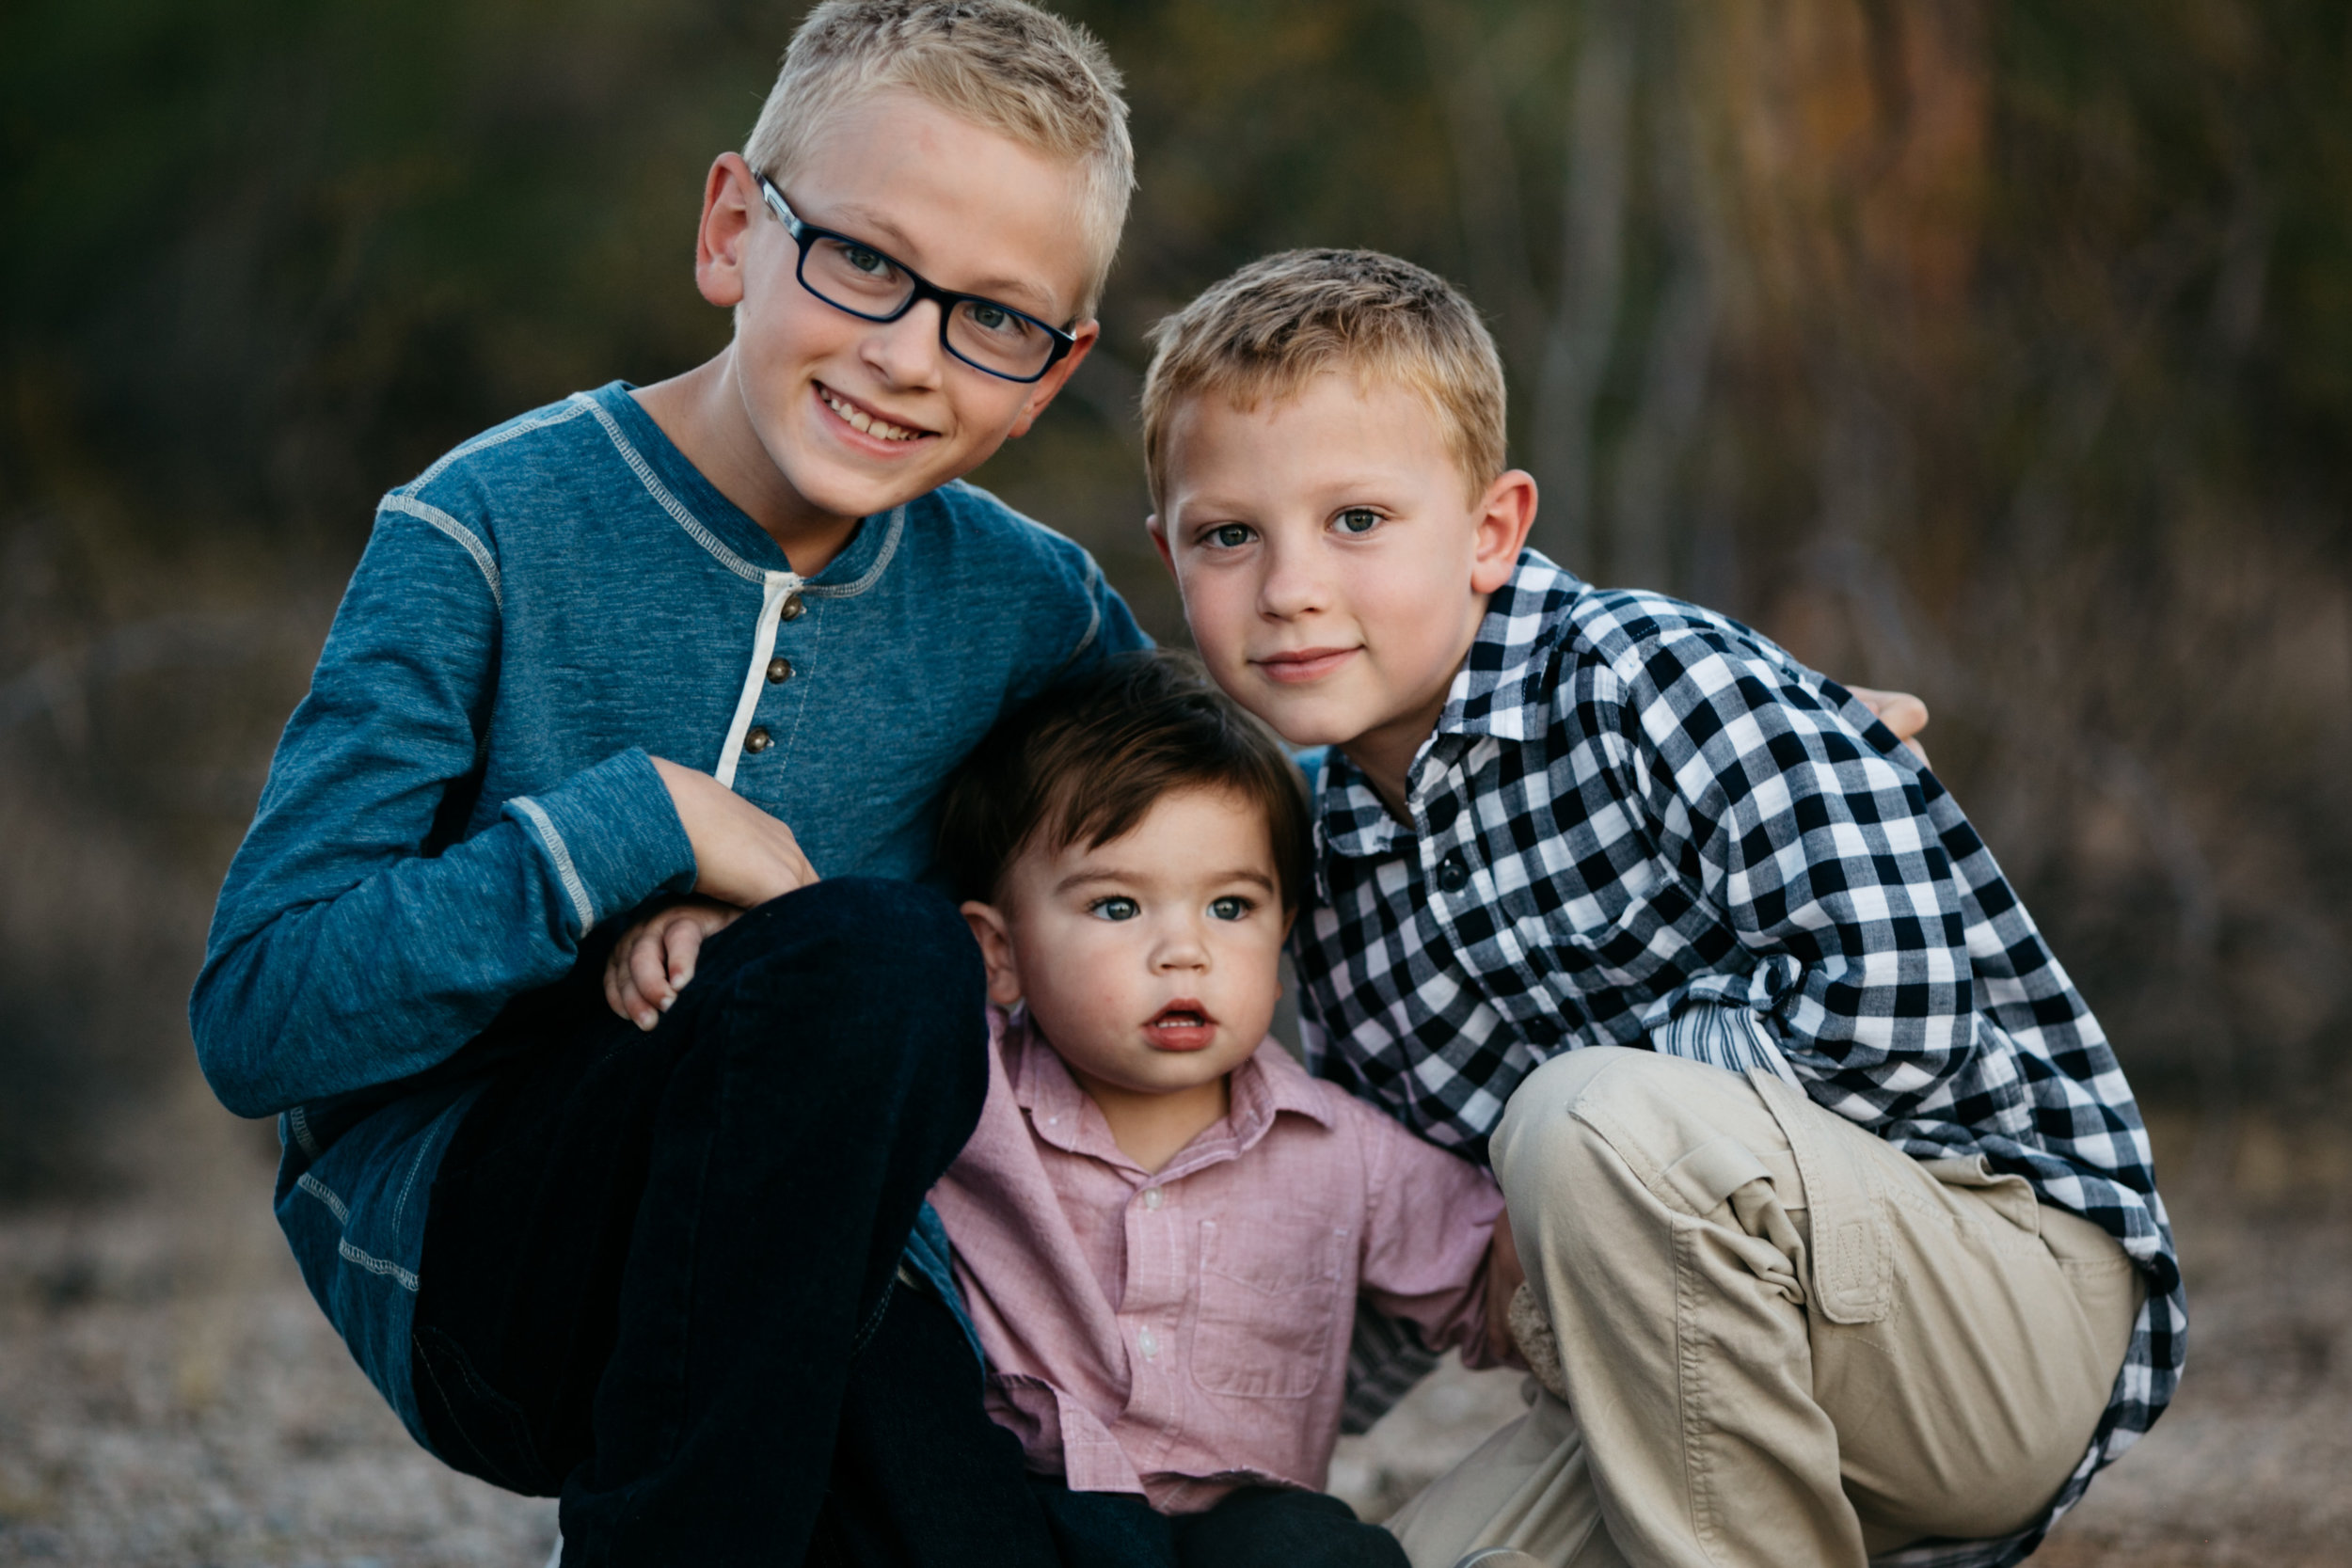 elan-photographie-studio-family-photography-79.jpg